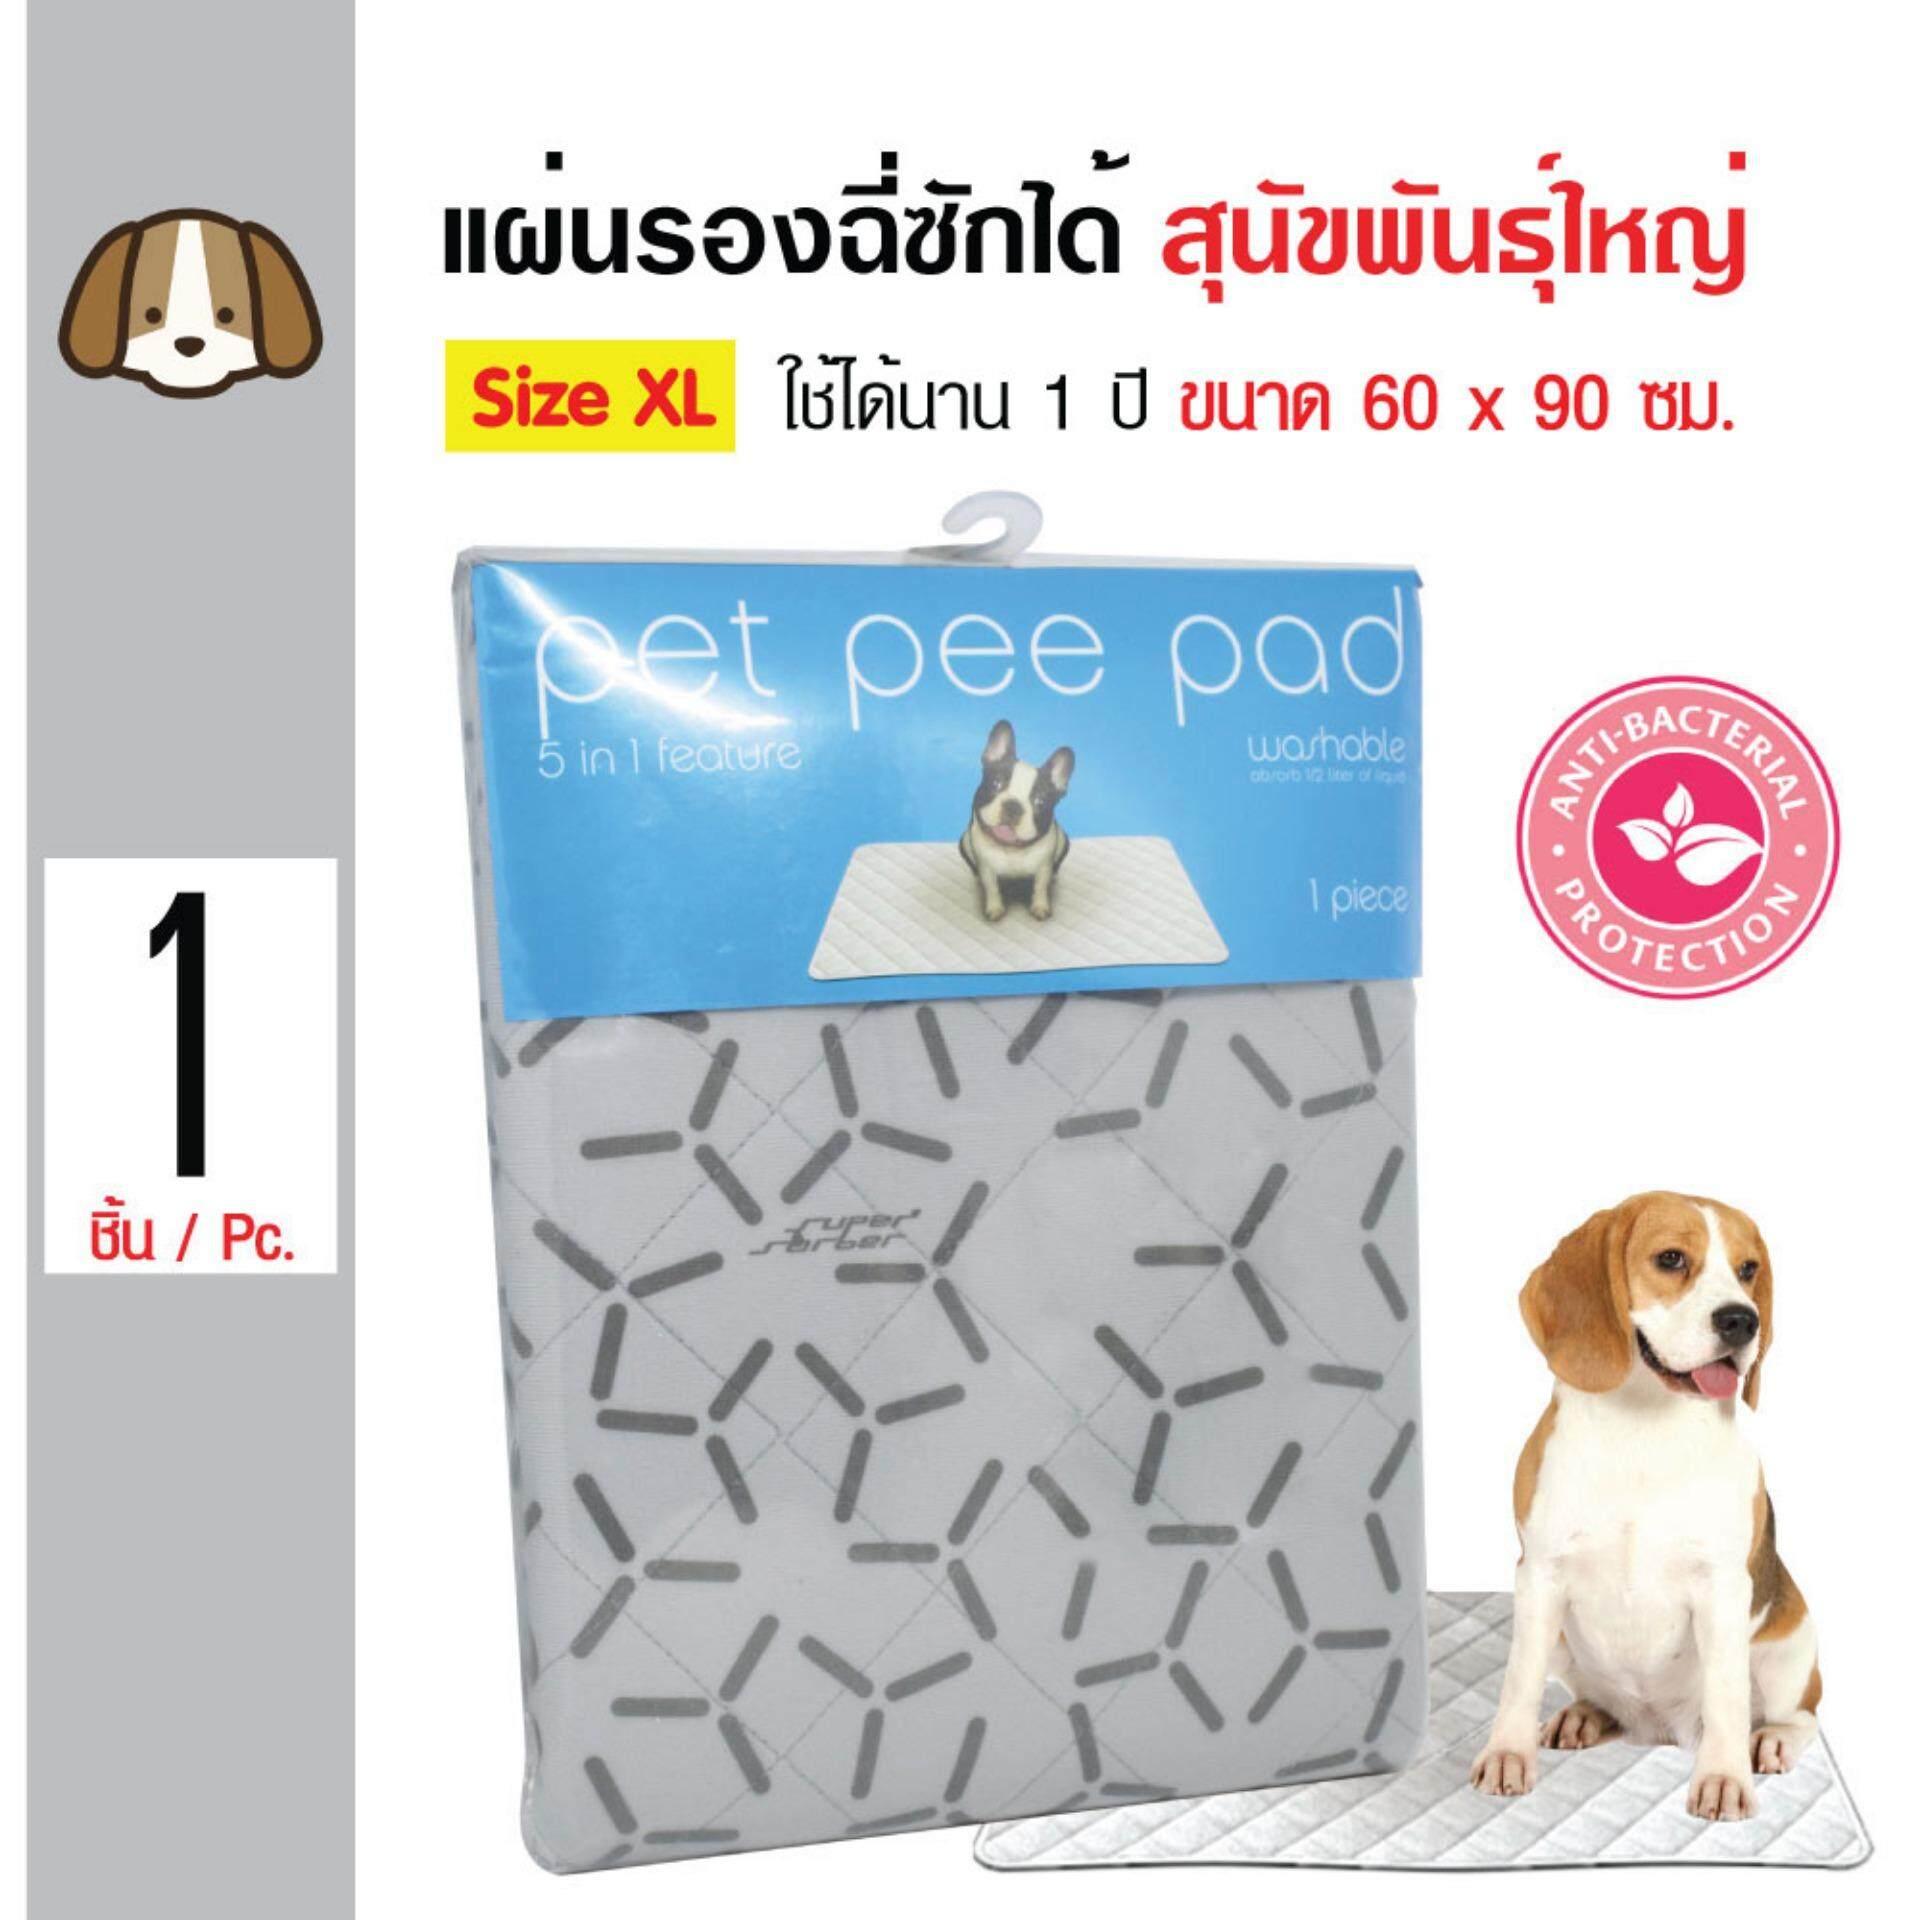 Pet Pee Pad แผ่นรองซับชนิดซักได้ แผ่นรองฉี่สุนัข แผ่นอนามัยสัตว์เลี้ยง สำหรับสุนัข Size XL ขนาด 60x90 ซม.